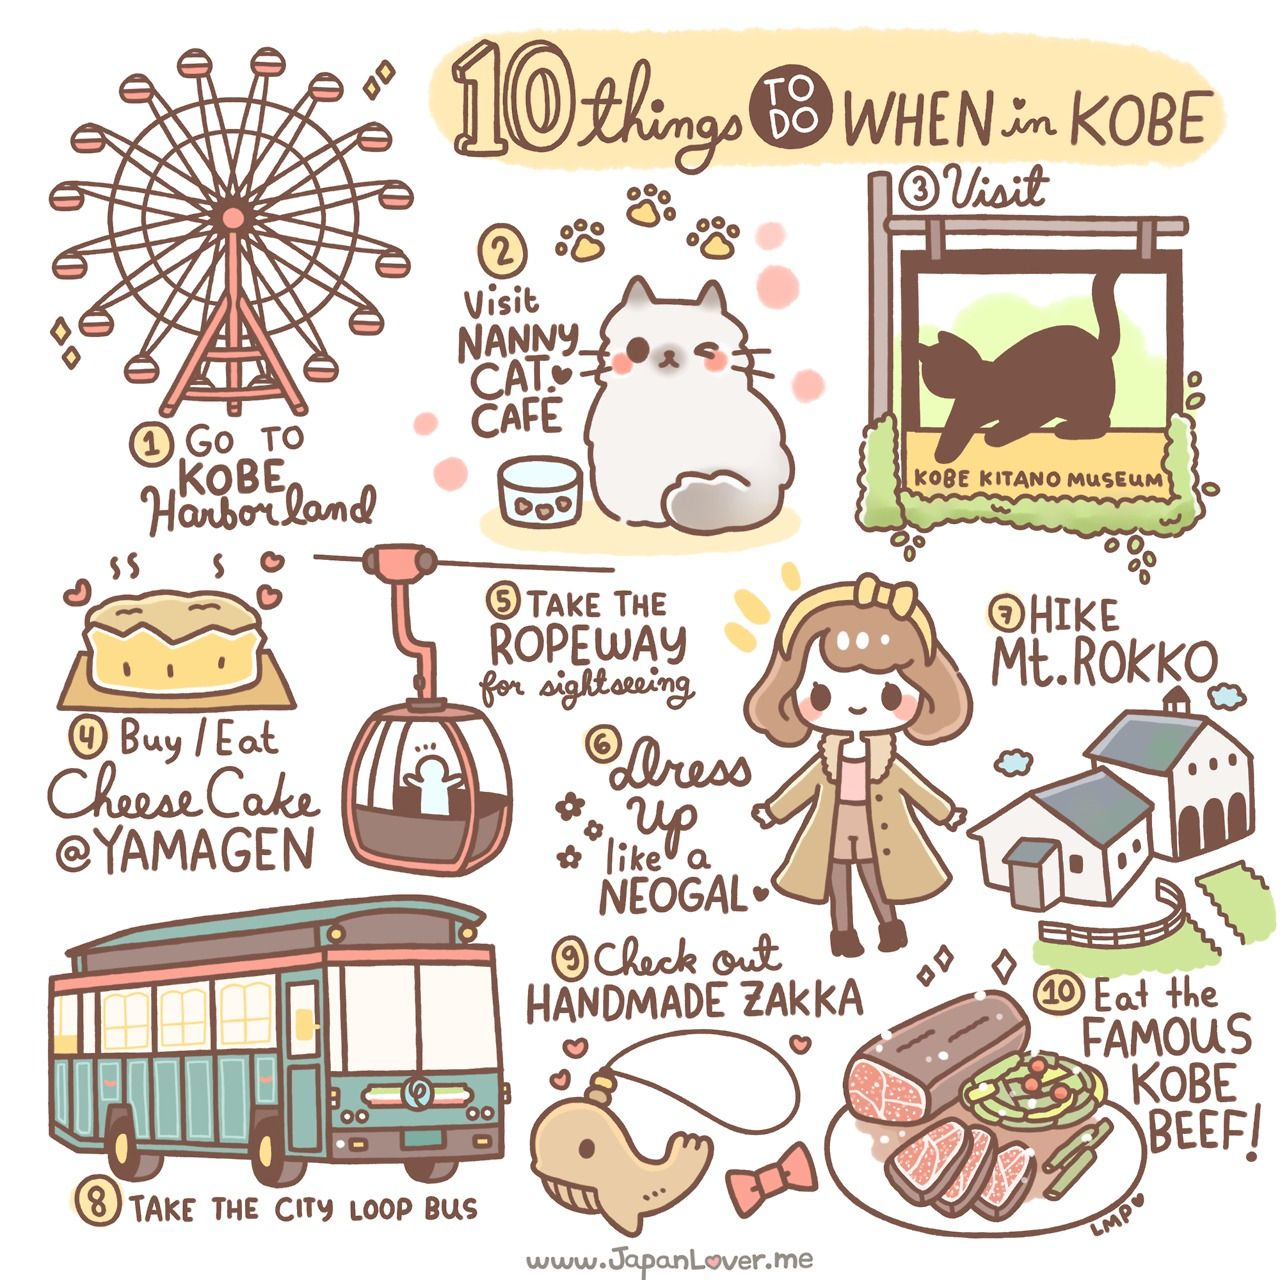 Pin by Miku-chan Neko on JapanLoverMe | Japan, Japan travel guide